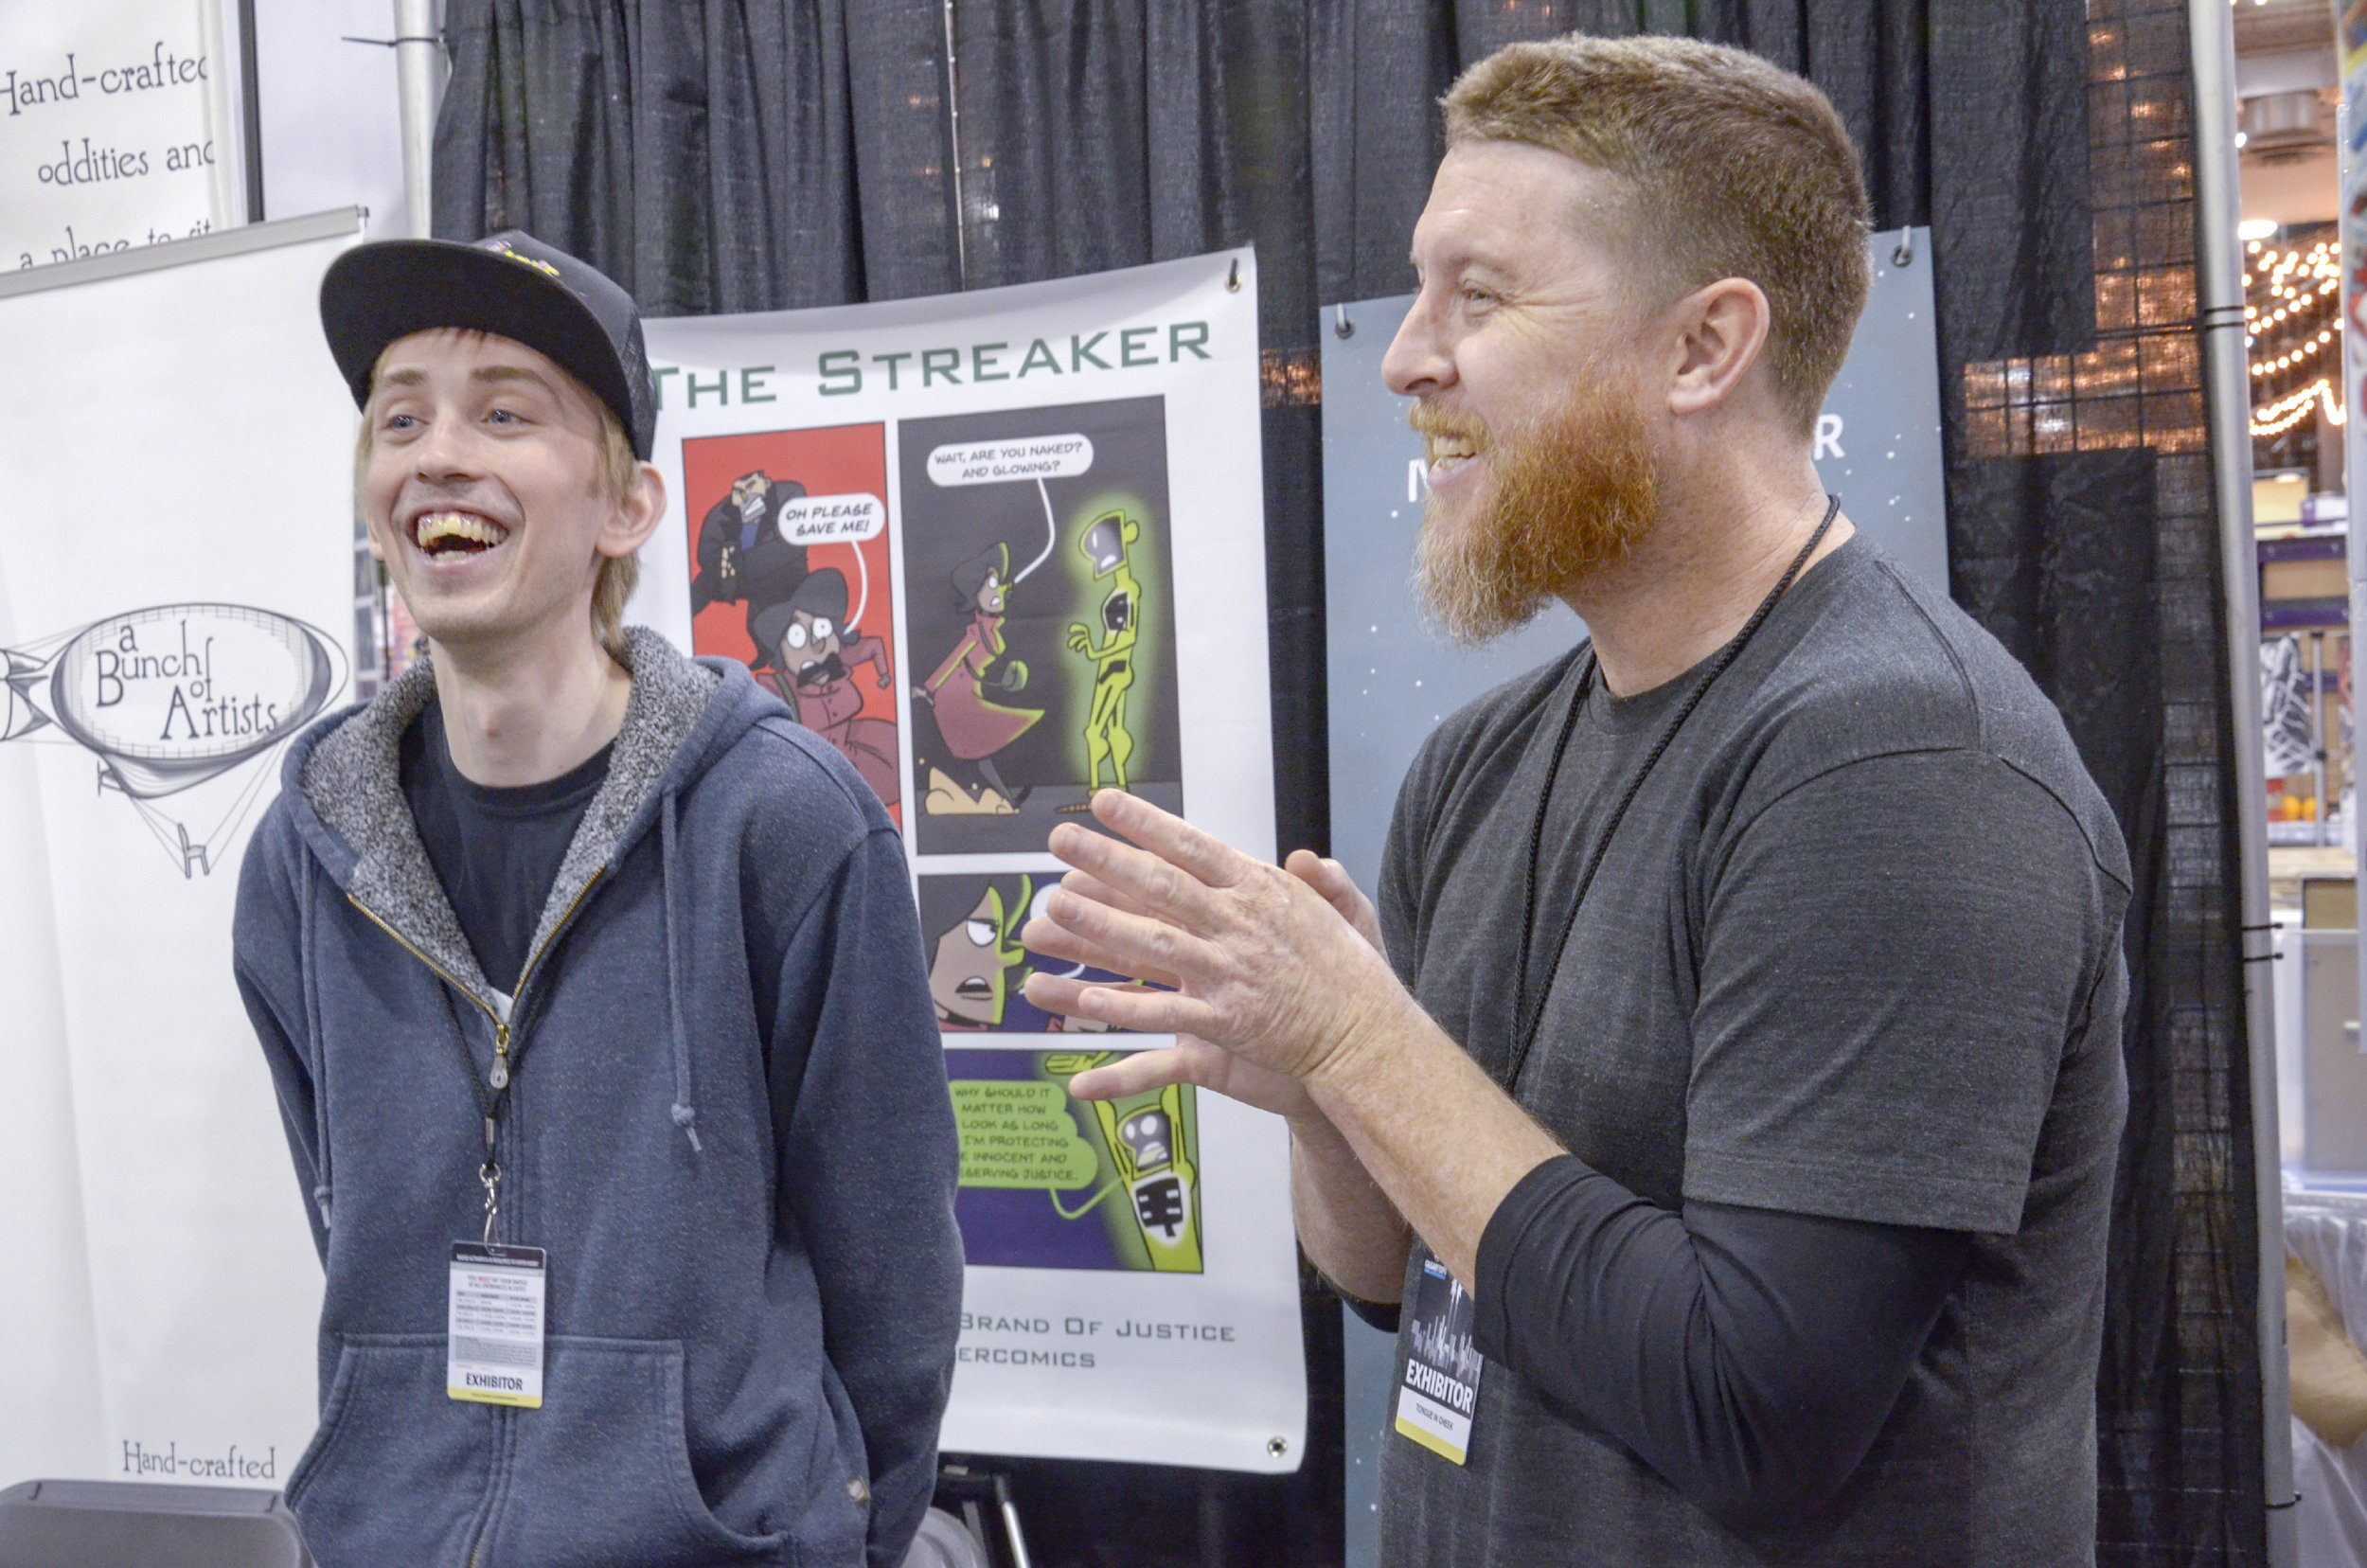 GeekNerdNet_Millar&Colpitts_CalgaryExpo2019_a.jpg